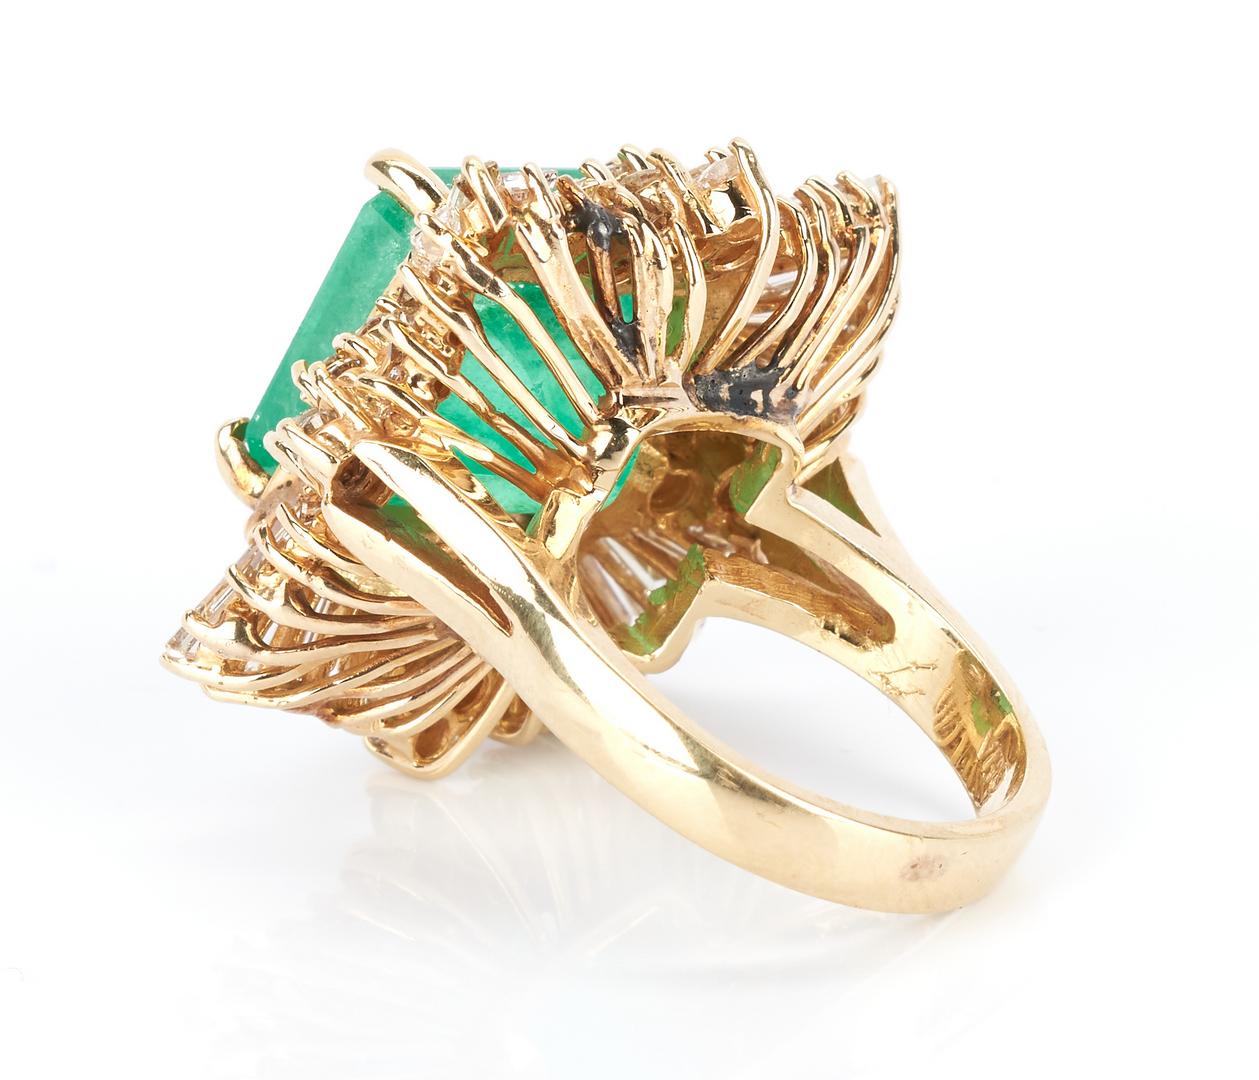 Lot 256: Ladies 14K Square Cut 13.8 Carat Emerald & Diamond Ring